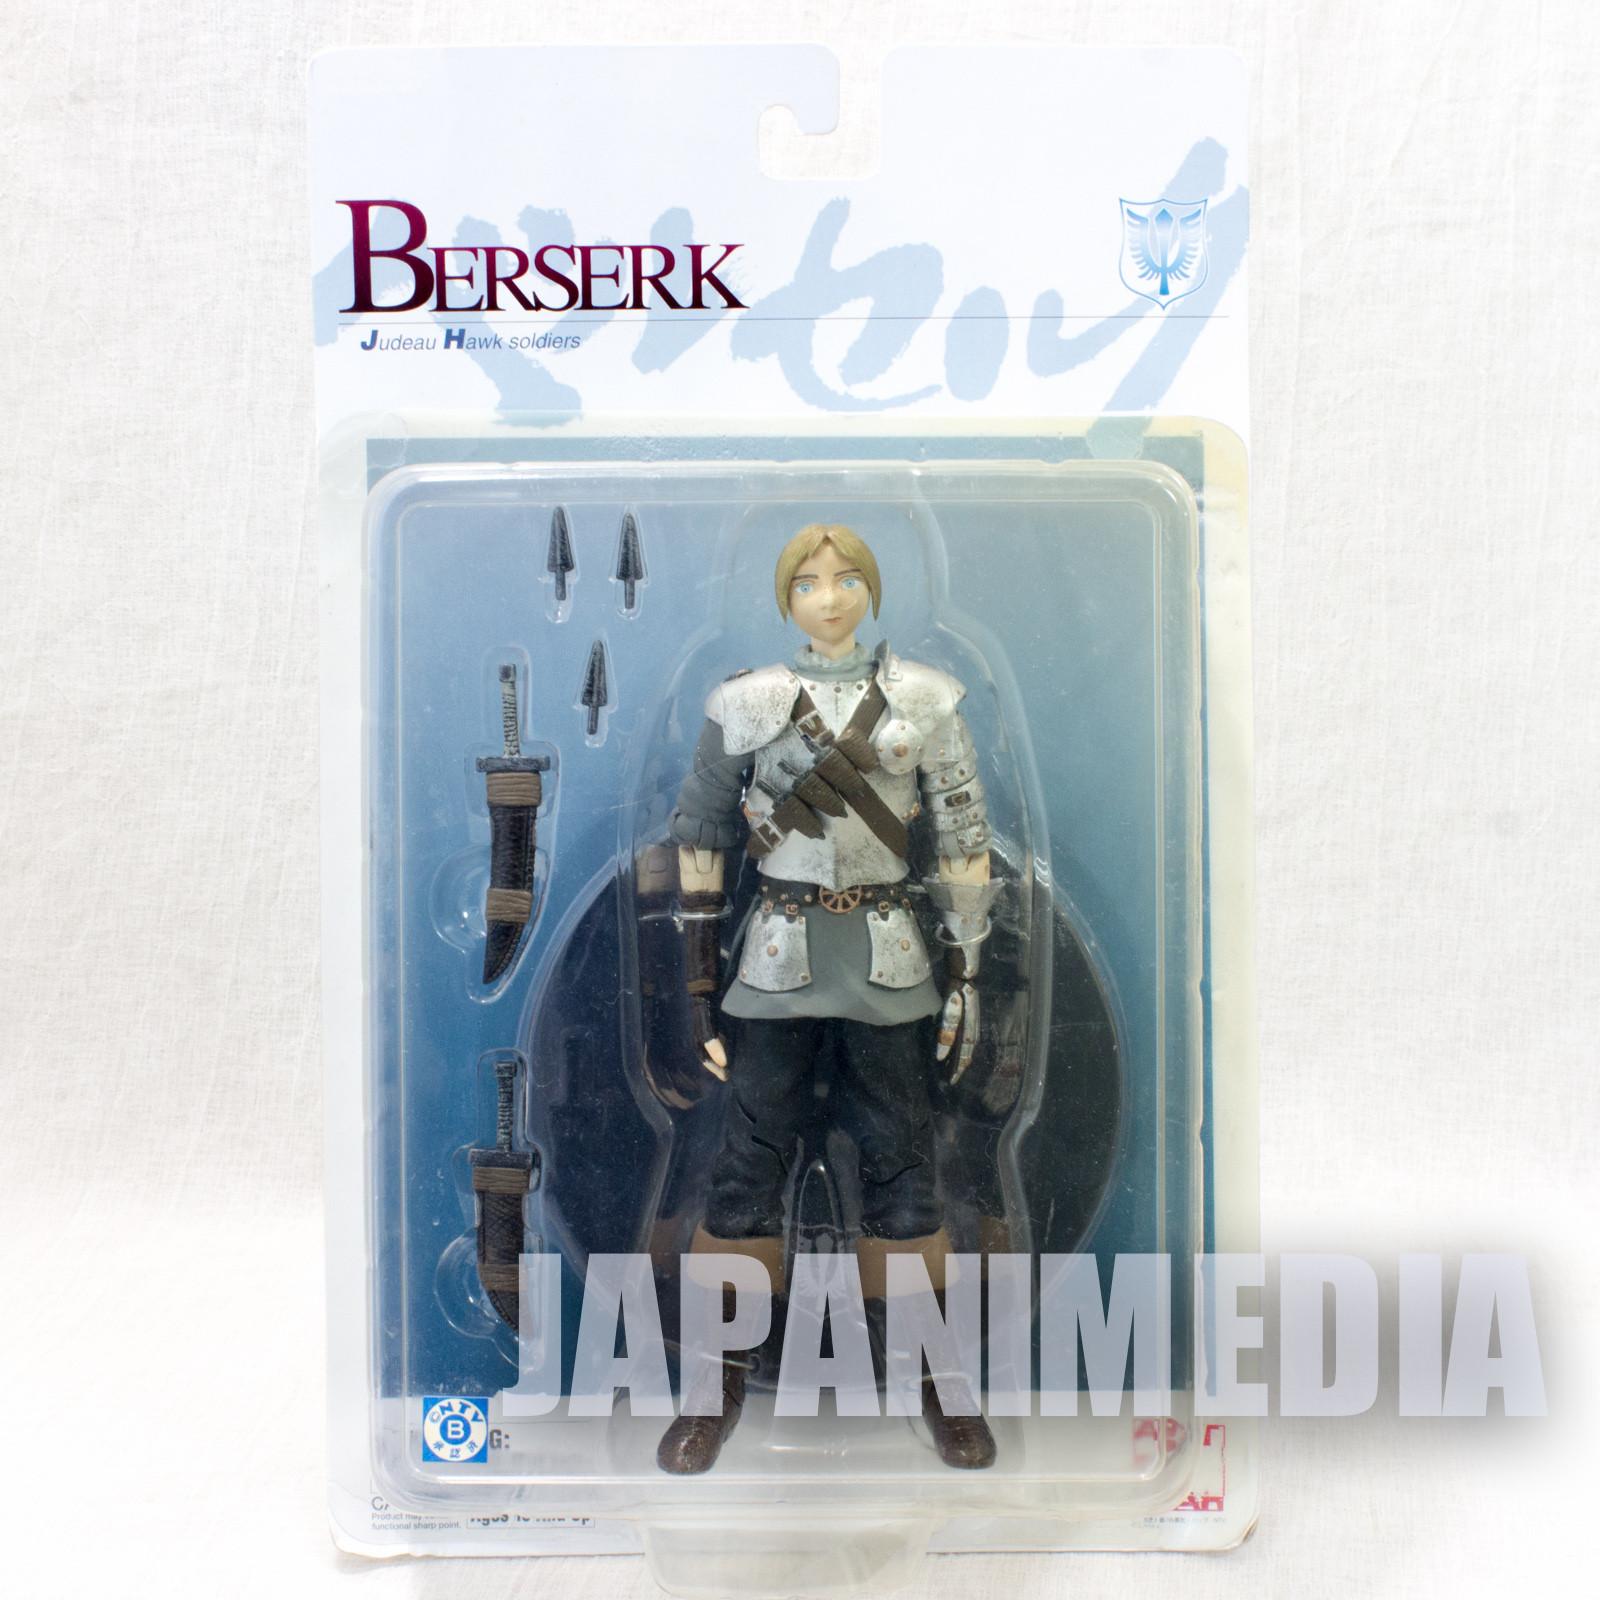 Berserk Judeau Hawk Soldiers Figure Art of War JAPAN ANIME MANGA